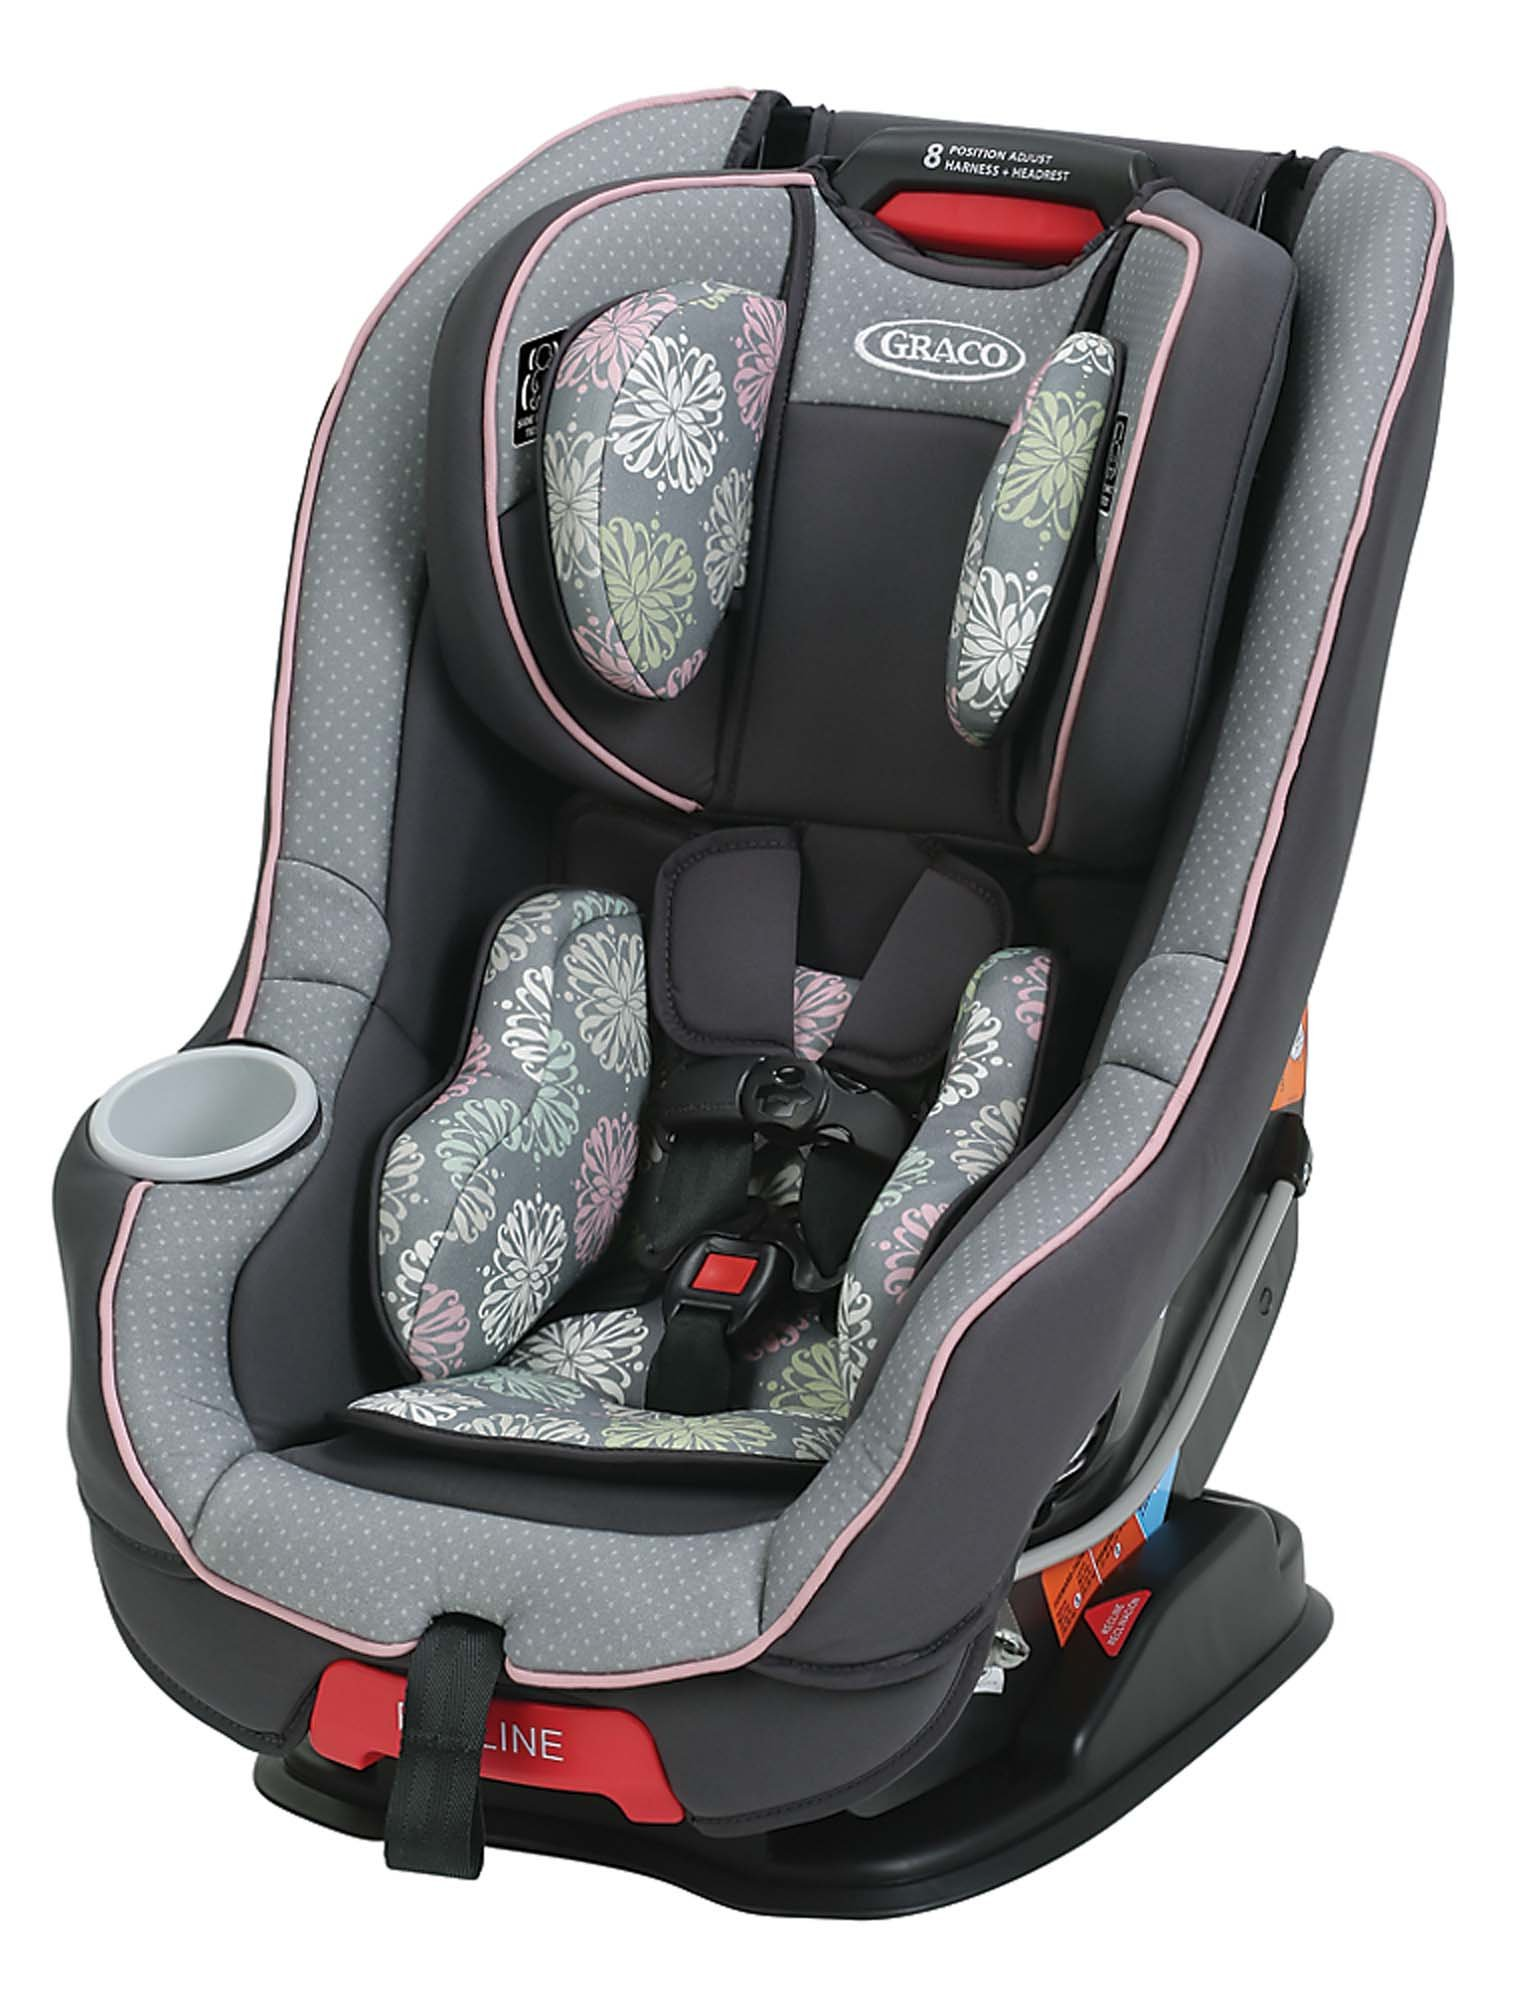 Graco Size4Me 65 Convertible Car Seat, Addison